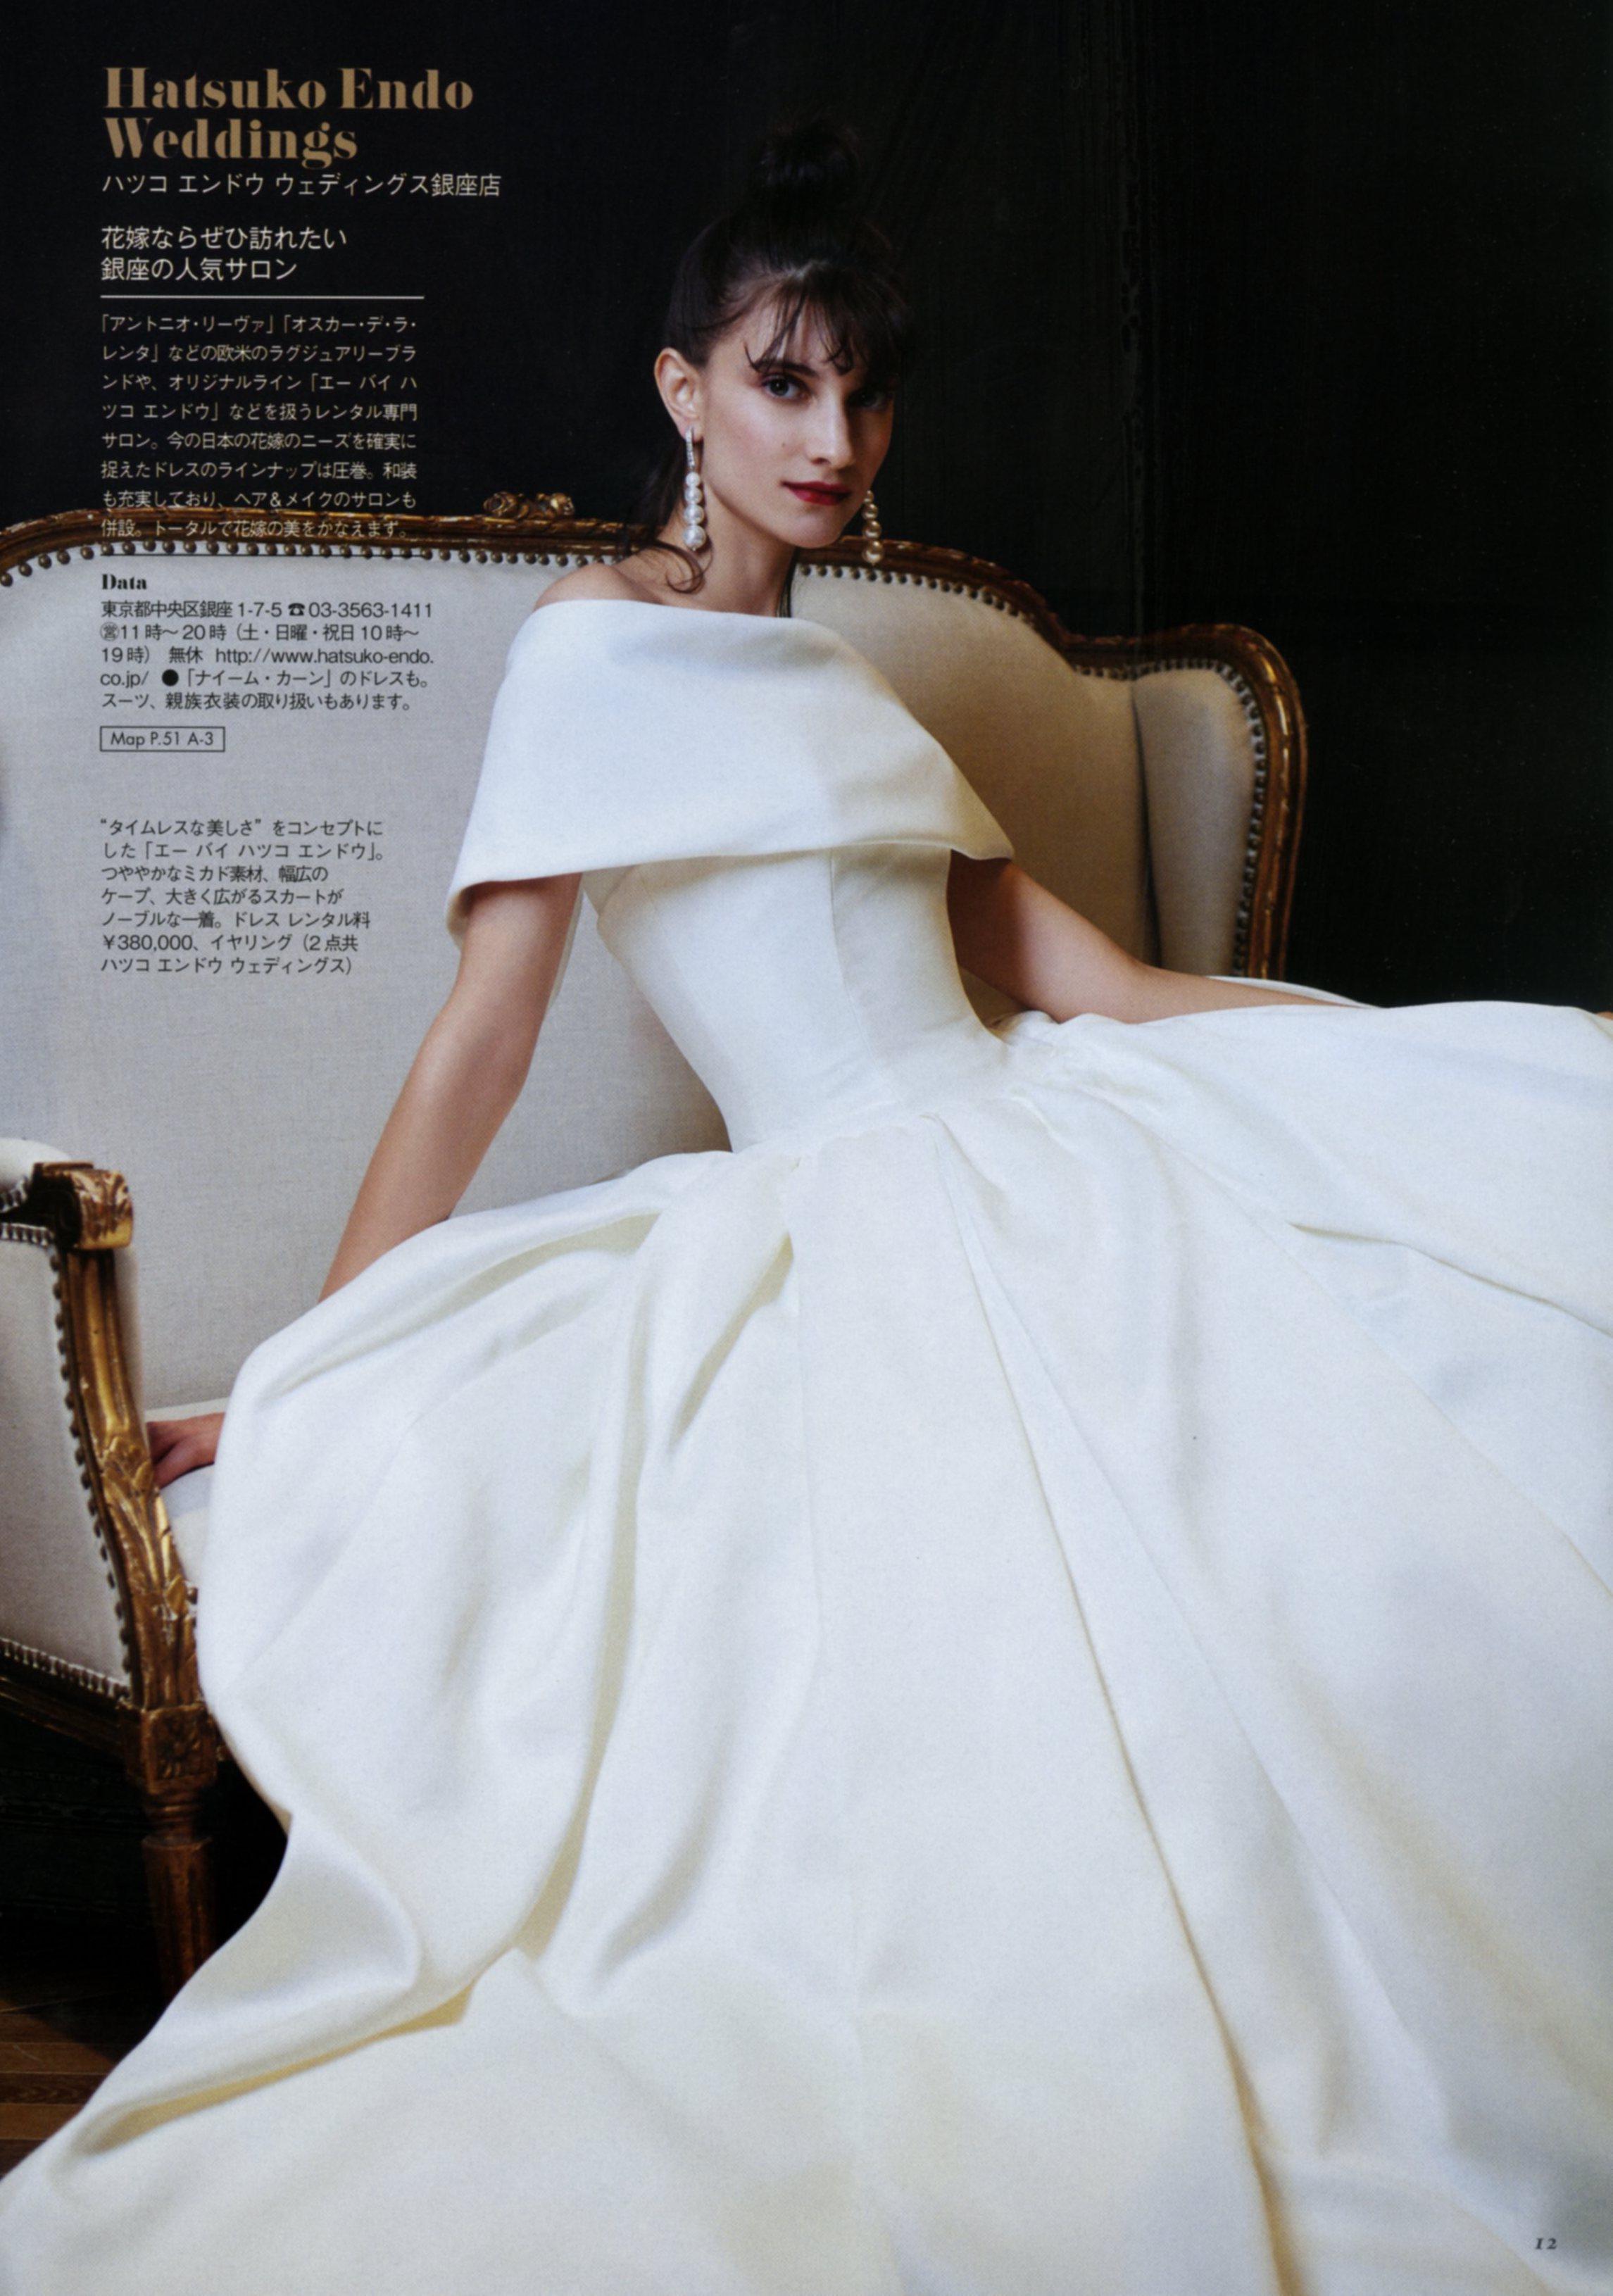 6月7日発売_25ans Wedding 2019 Summer 【別冊付録1:GINZA WEDDING BOOK】 P.10